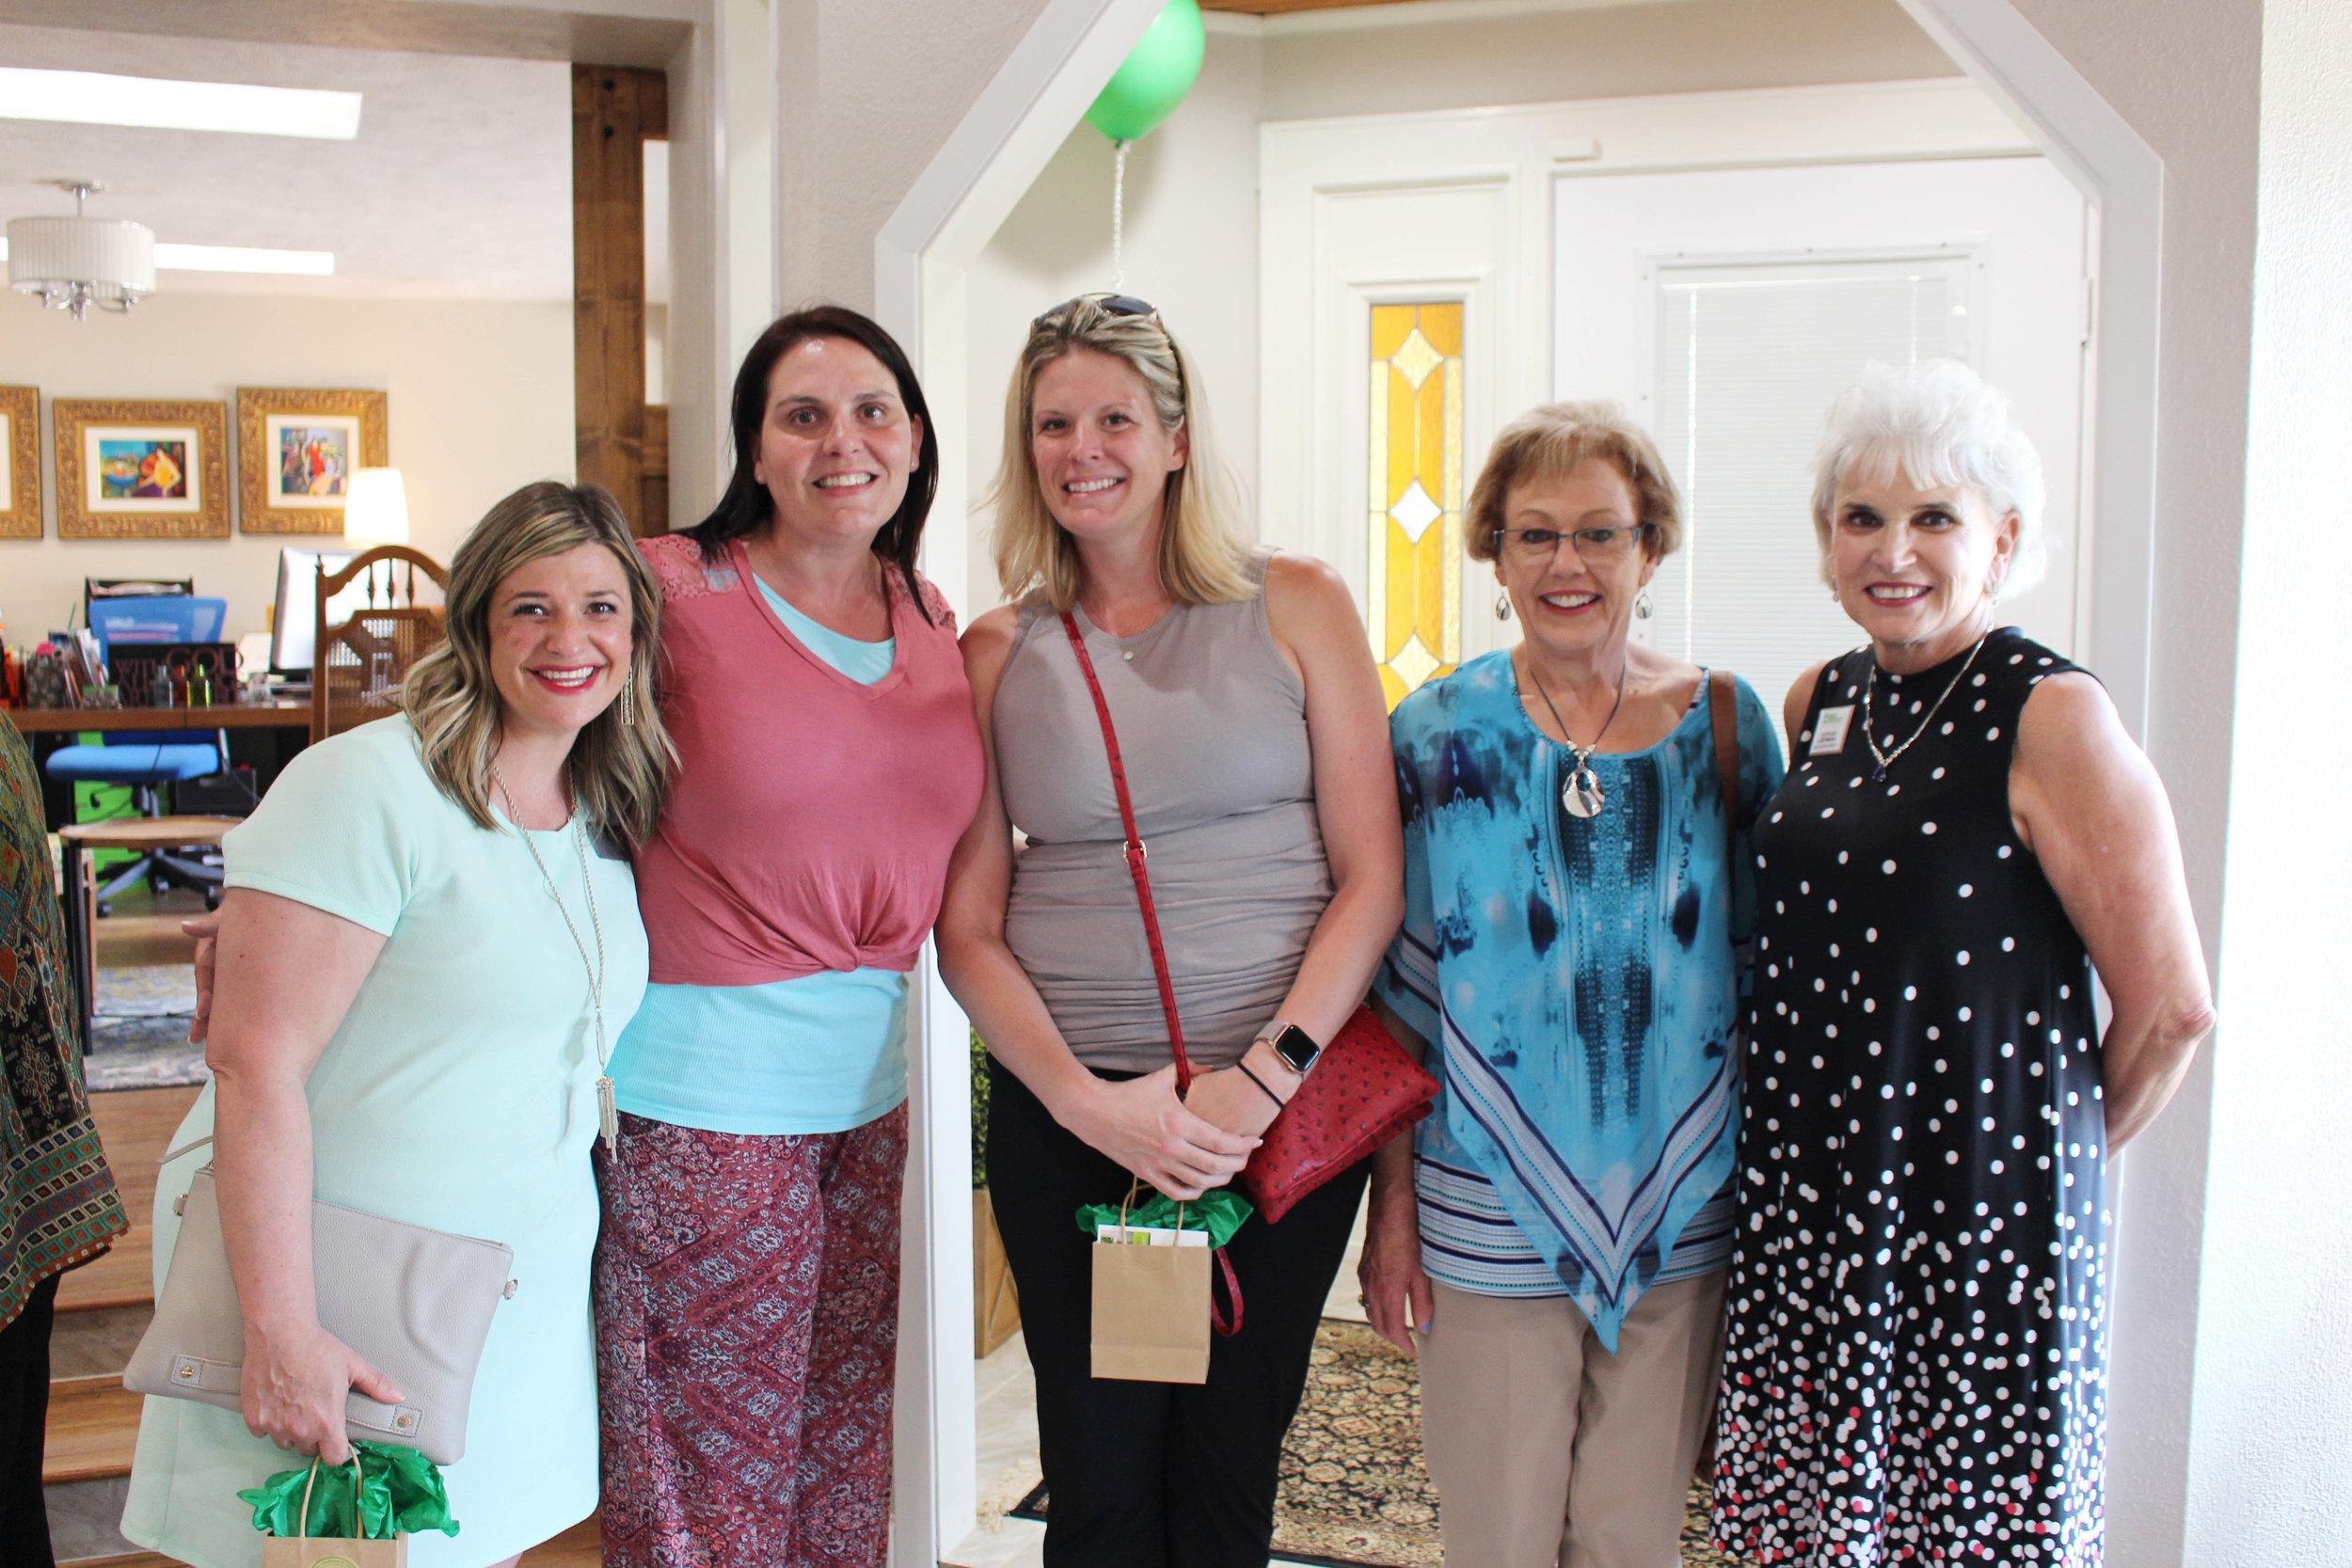 Jade Evans, Bridget Contreras, Katie Peek, Carolyn Faoliu and Teresa Liepman